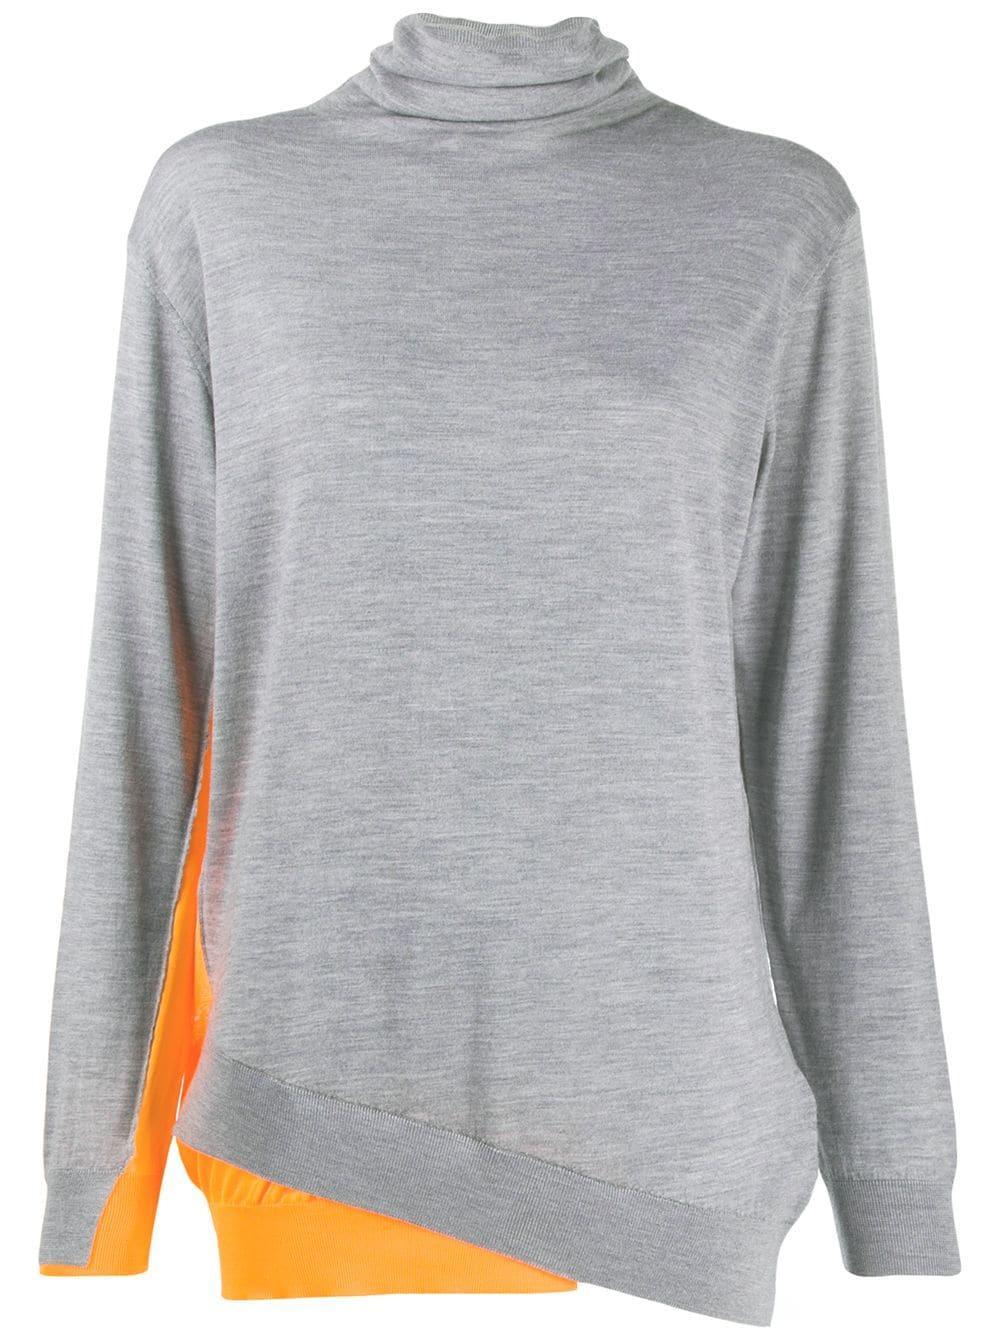 Layer Love Turtleneck Sweater